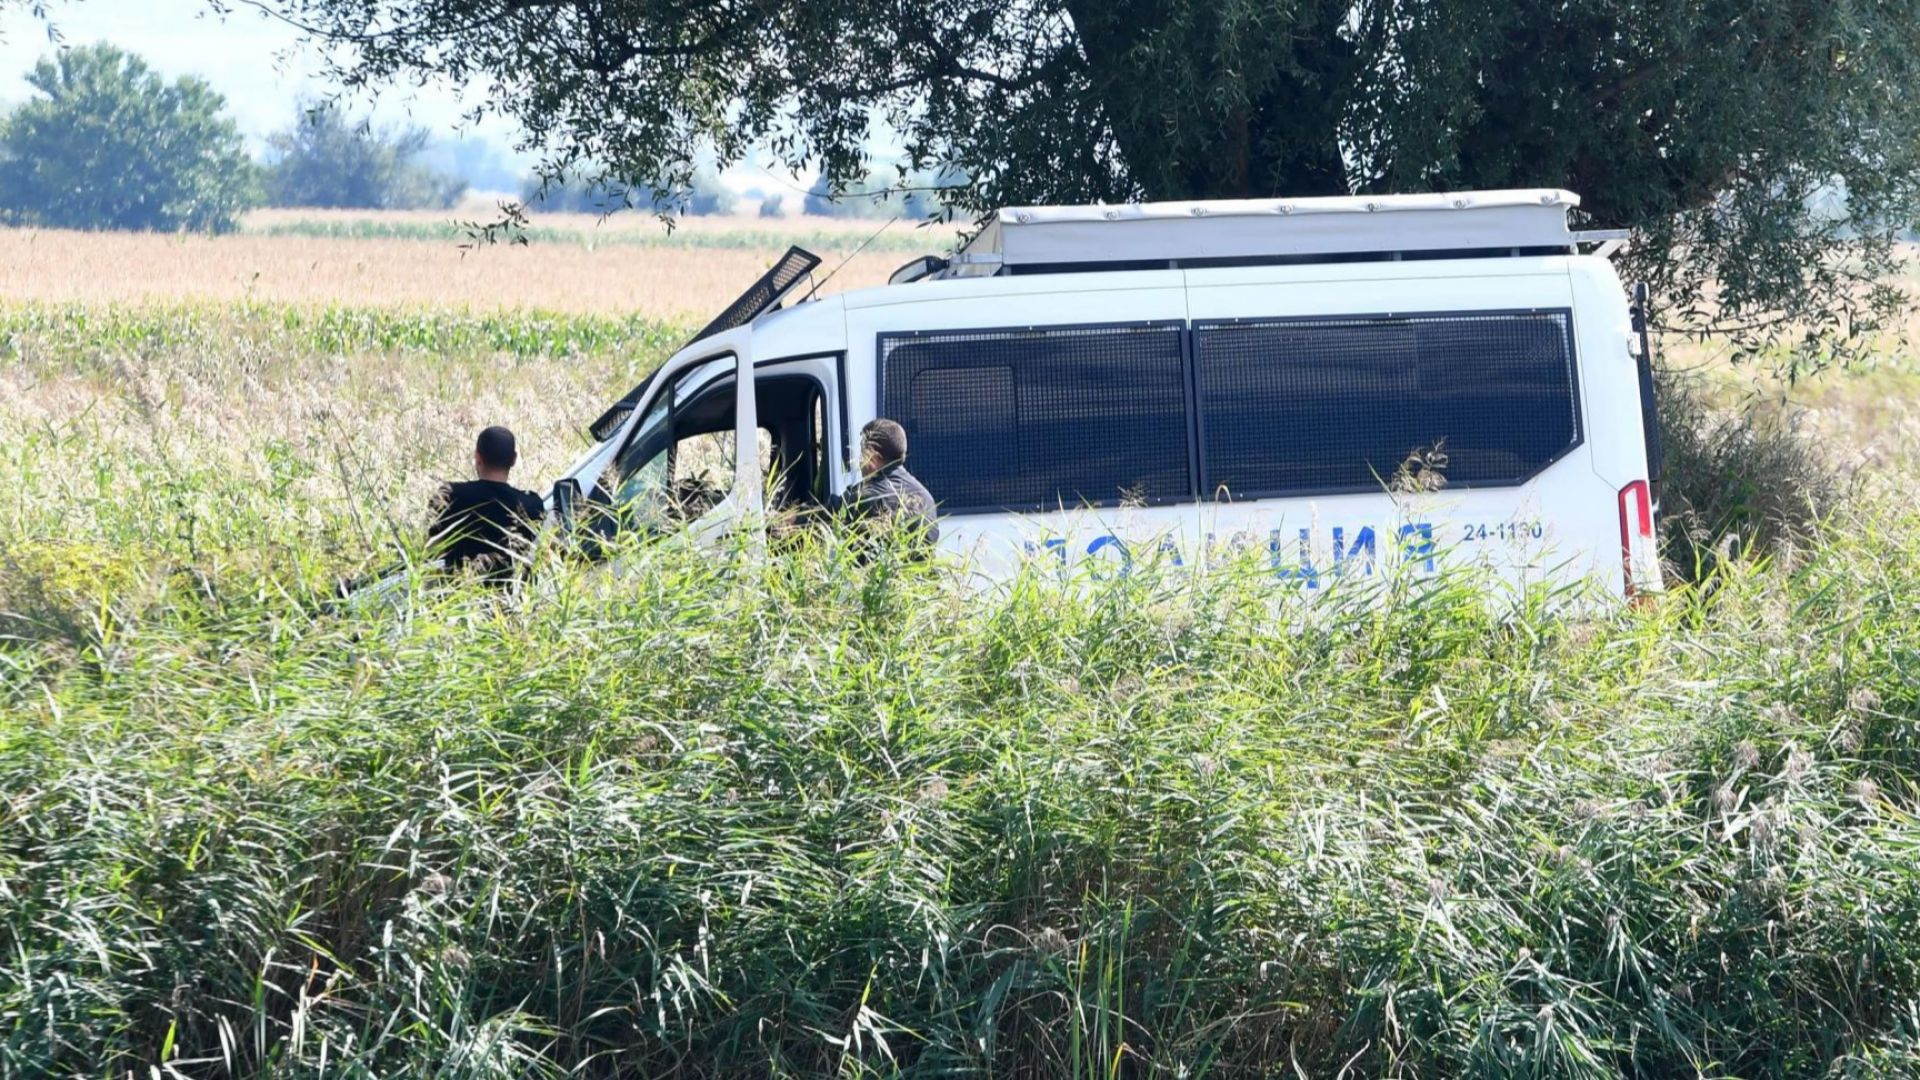 Ботьо Ботев: В България не е имало двойно убийство с двойно разчленяване